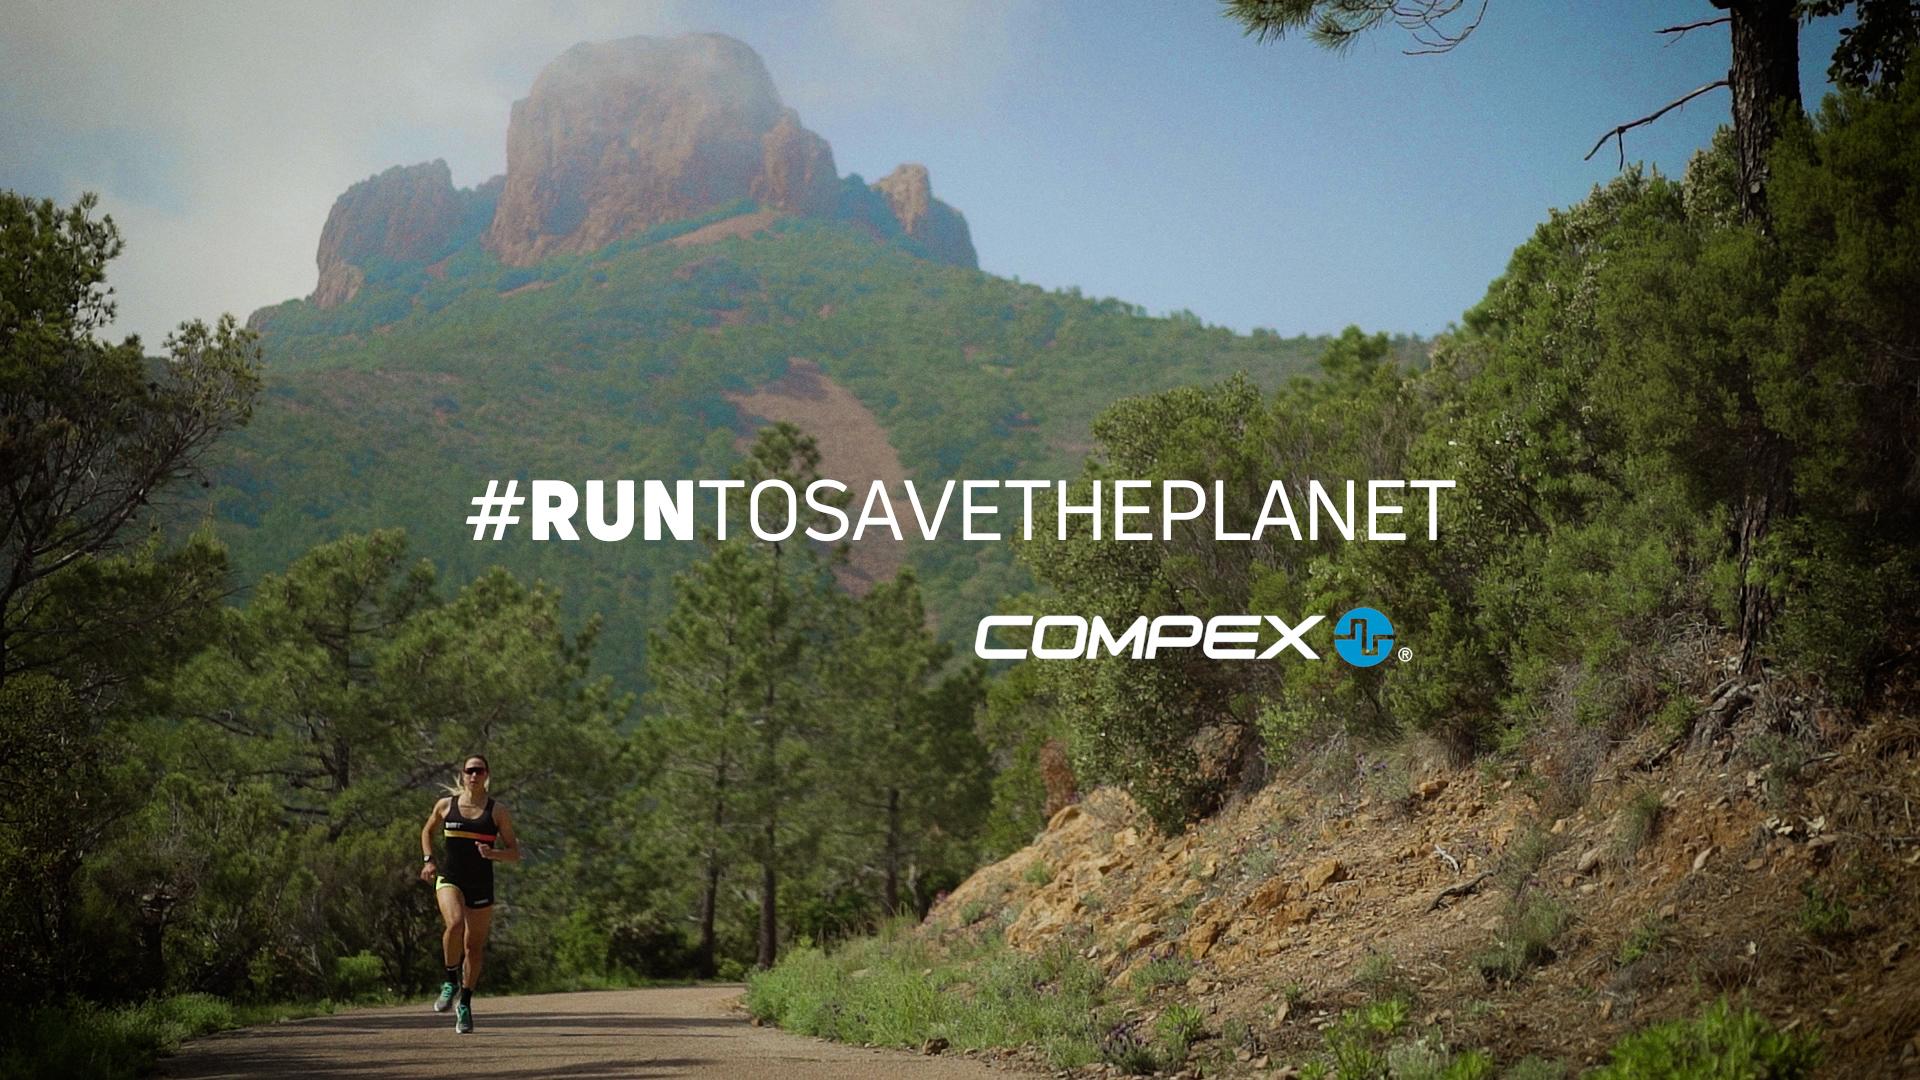 Correre insieme per l'ambiente! #RunToSaveThePlanet